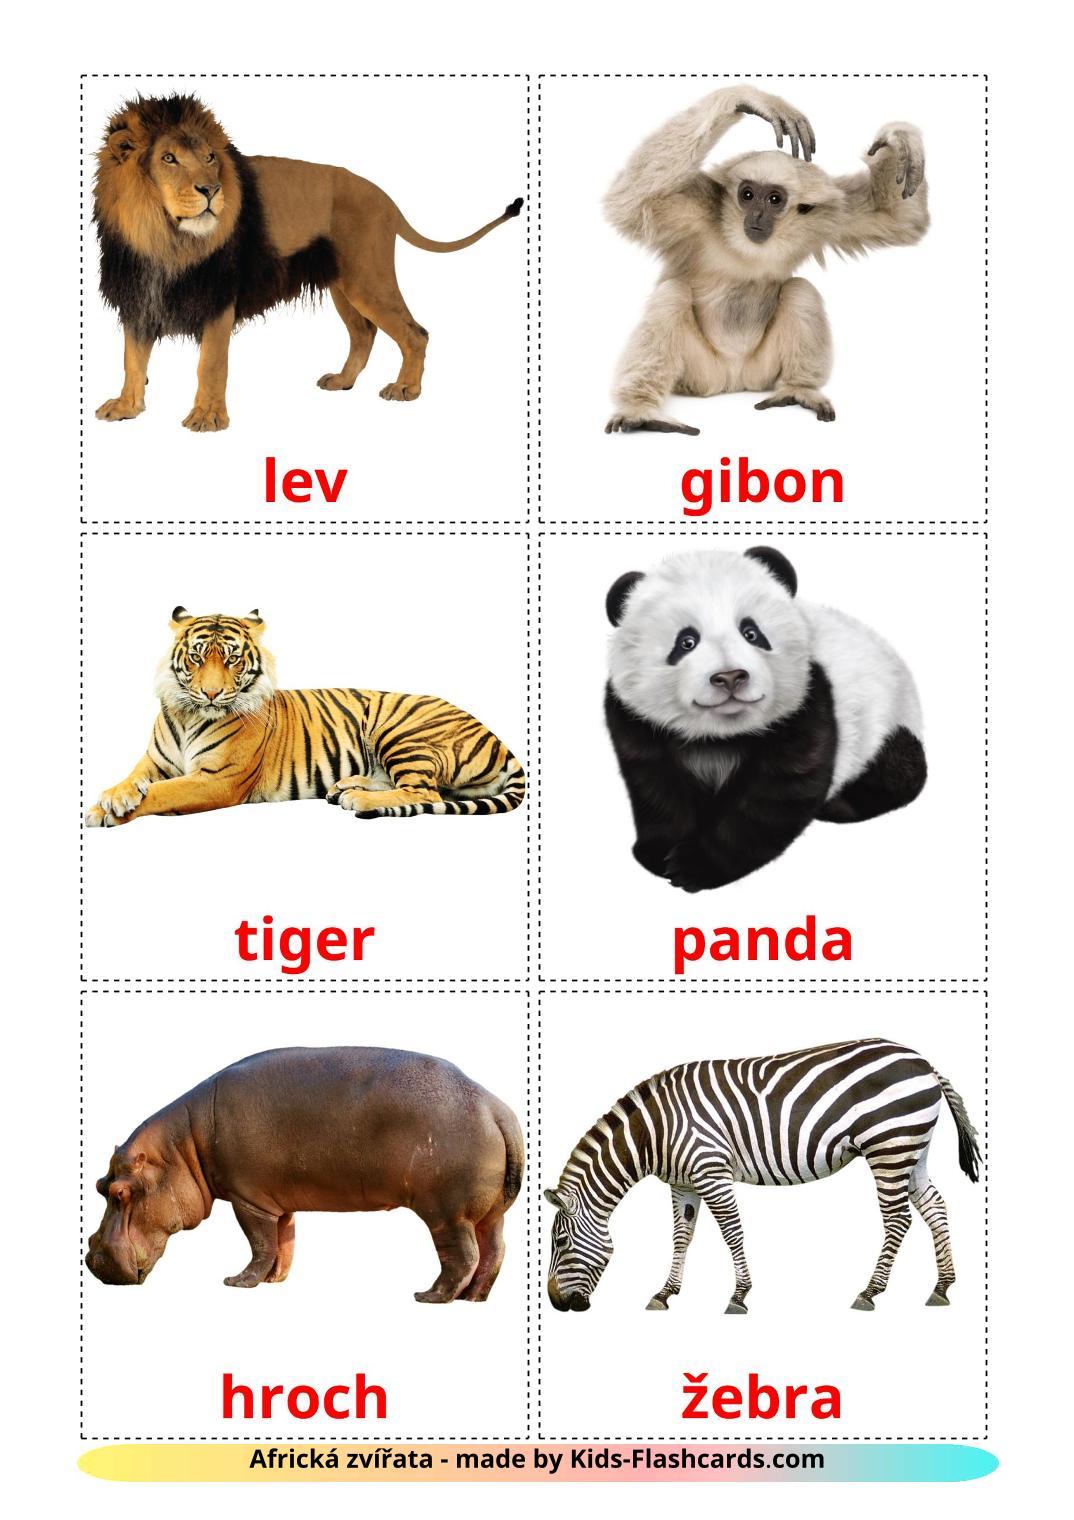 Jungle animals - 21 Free Printable czech Flashcards